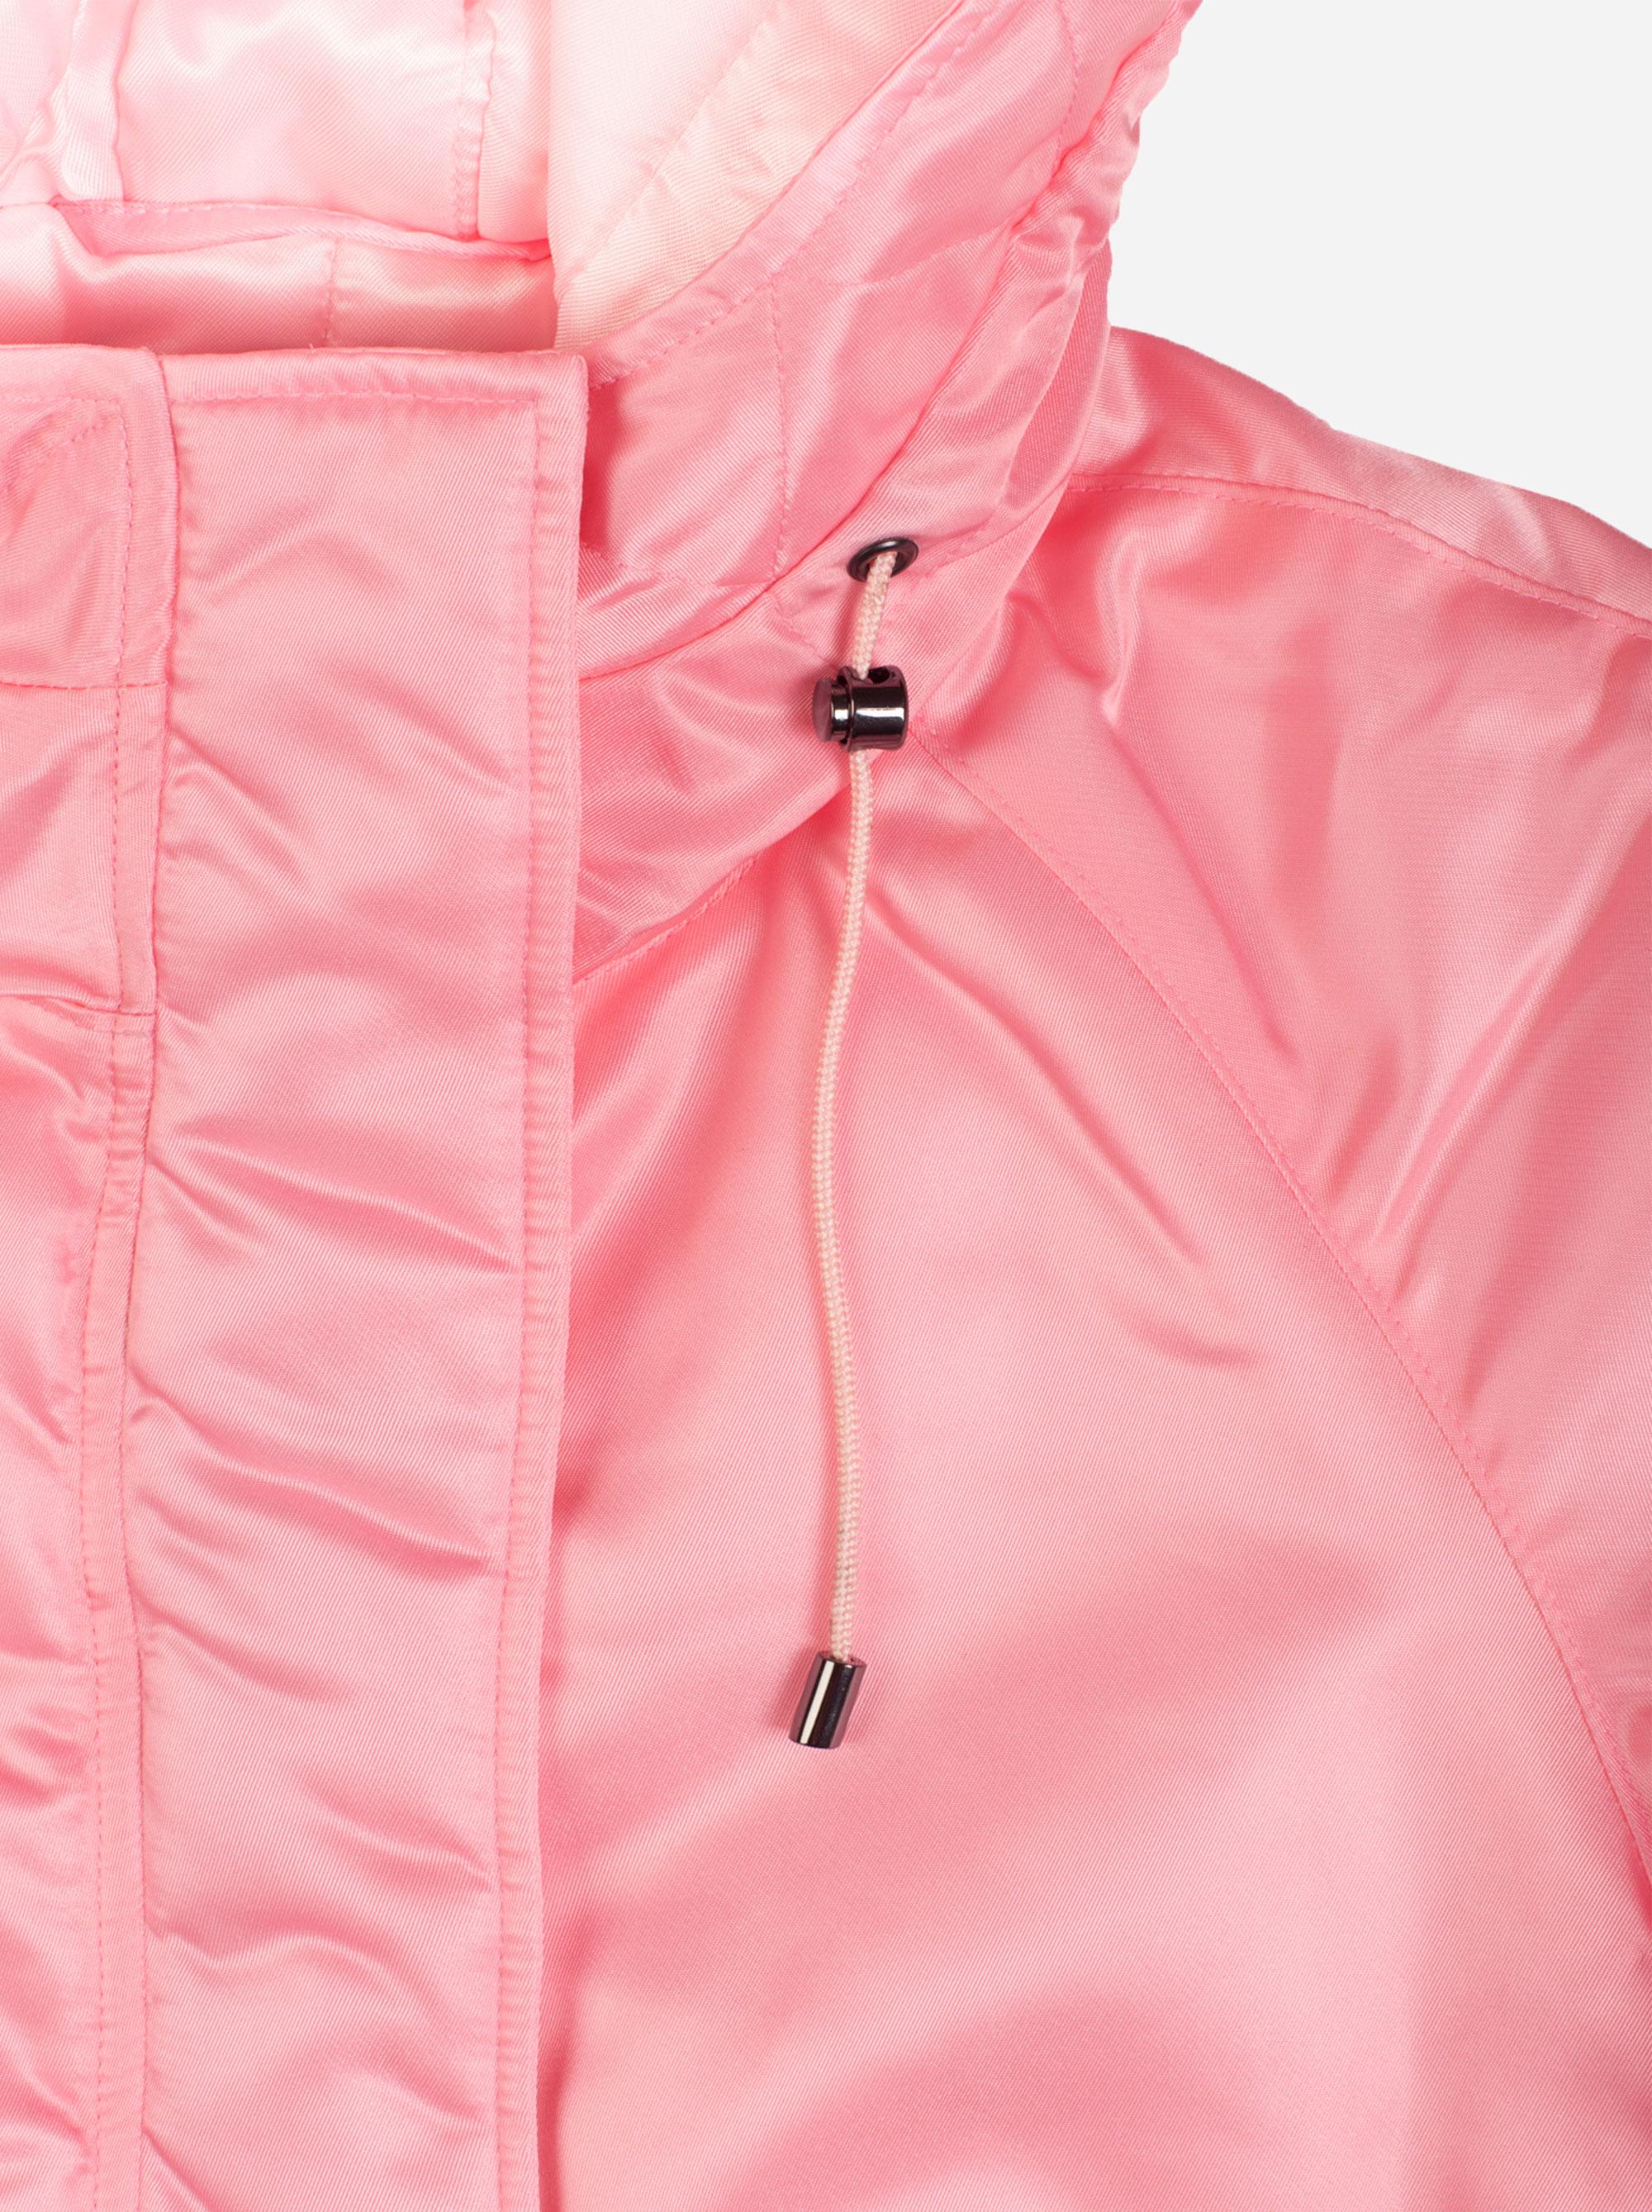 Teym - The Parka - Women - Pink - Short - 6